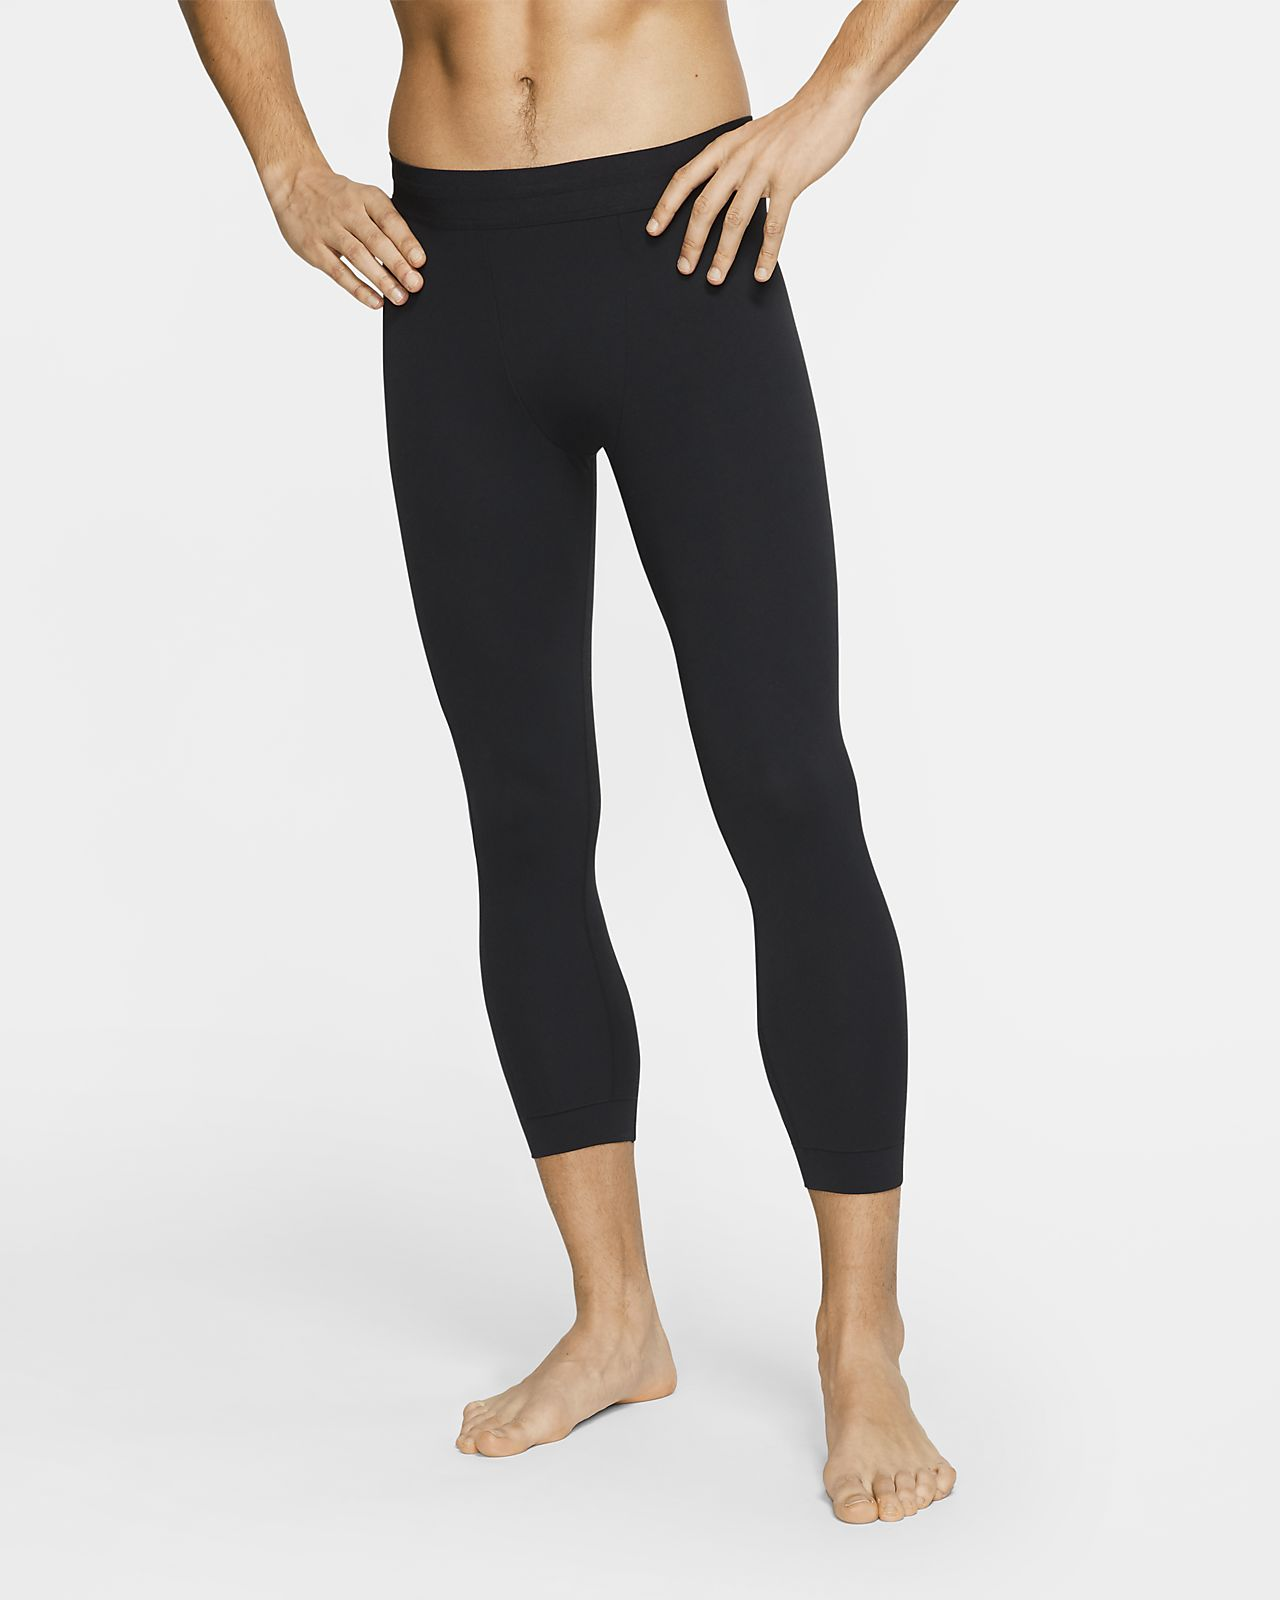 Nike Yoga Men's 3/4 Tights